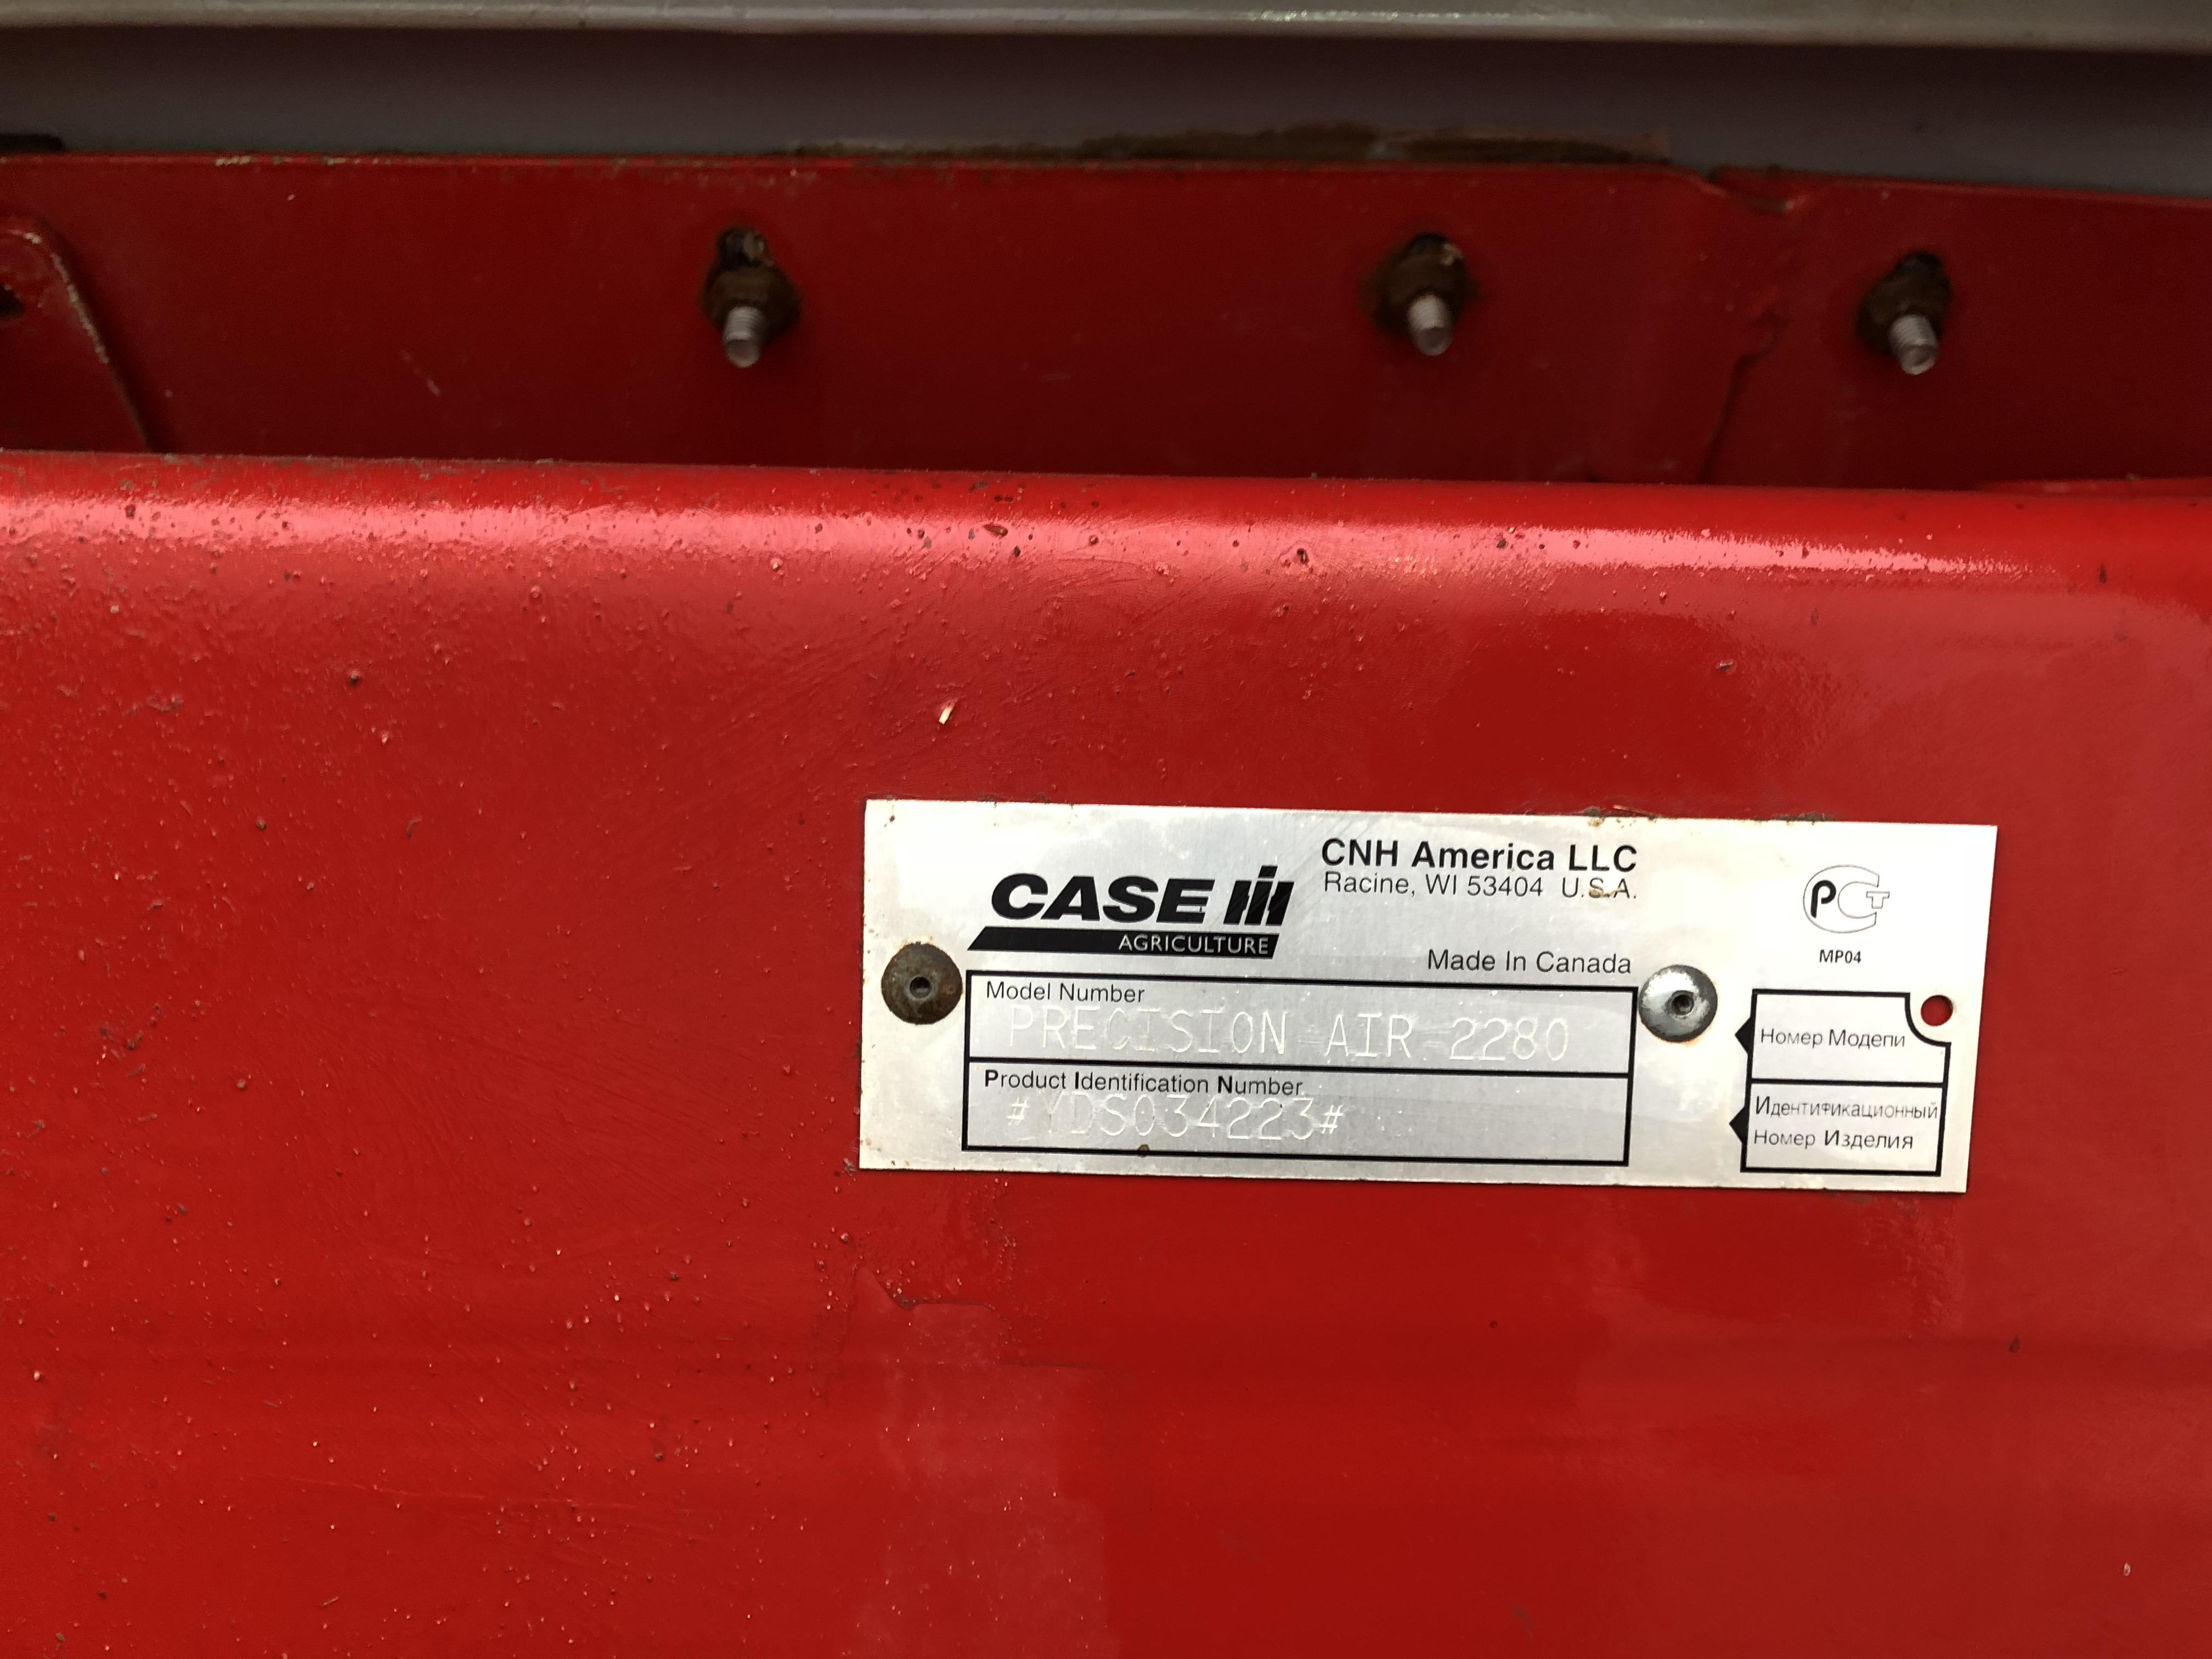 Case IH Precision Air® 2280